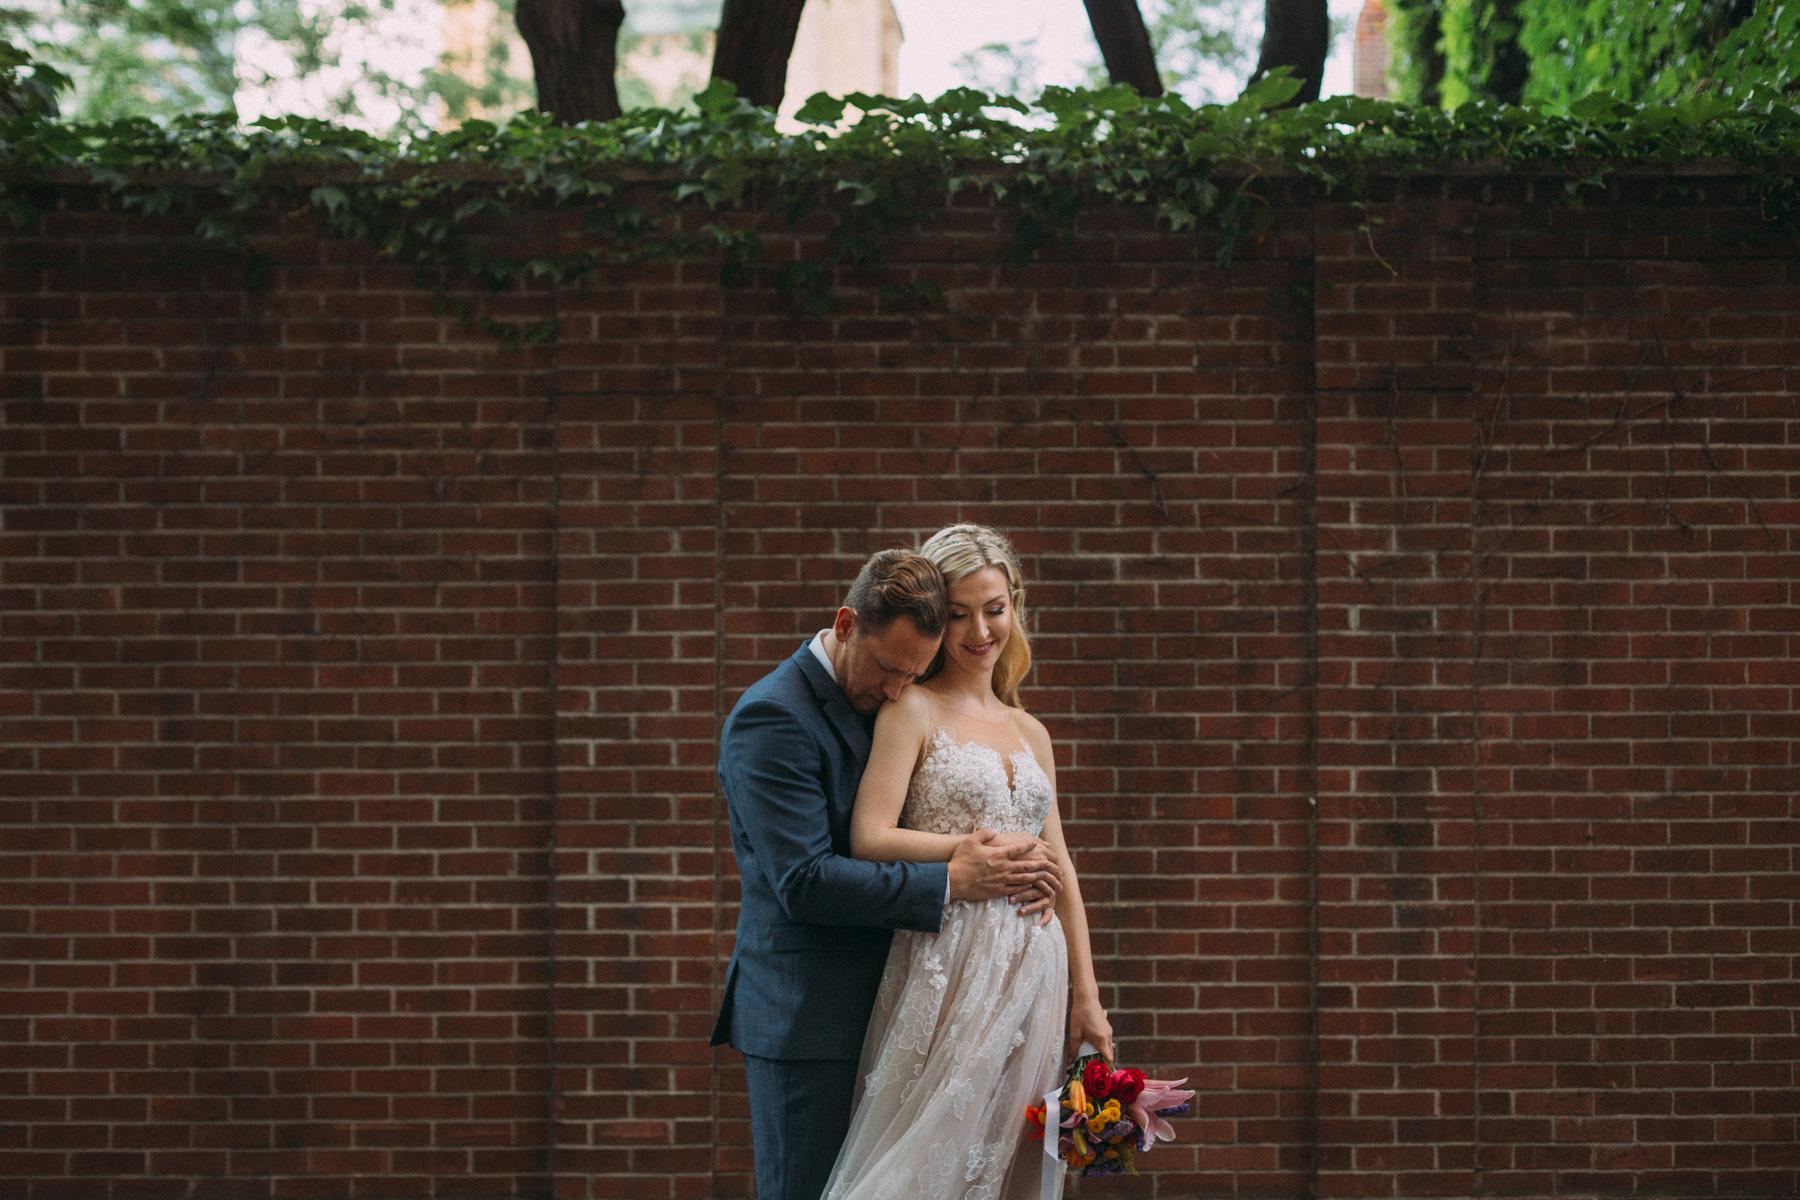 La-Maquette-wedding-by-Toronto-modern-wedding-photographer-Sam-Wong_23.jpg